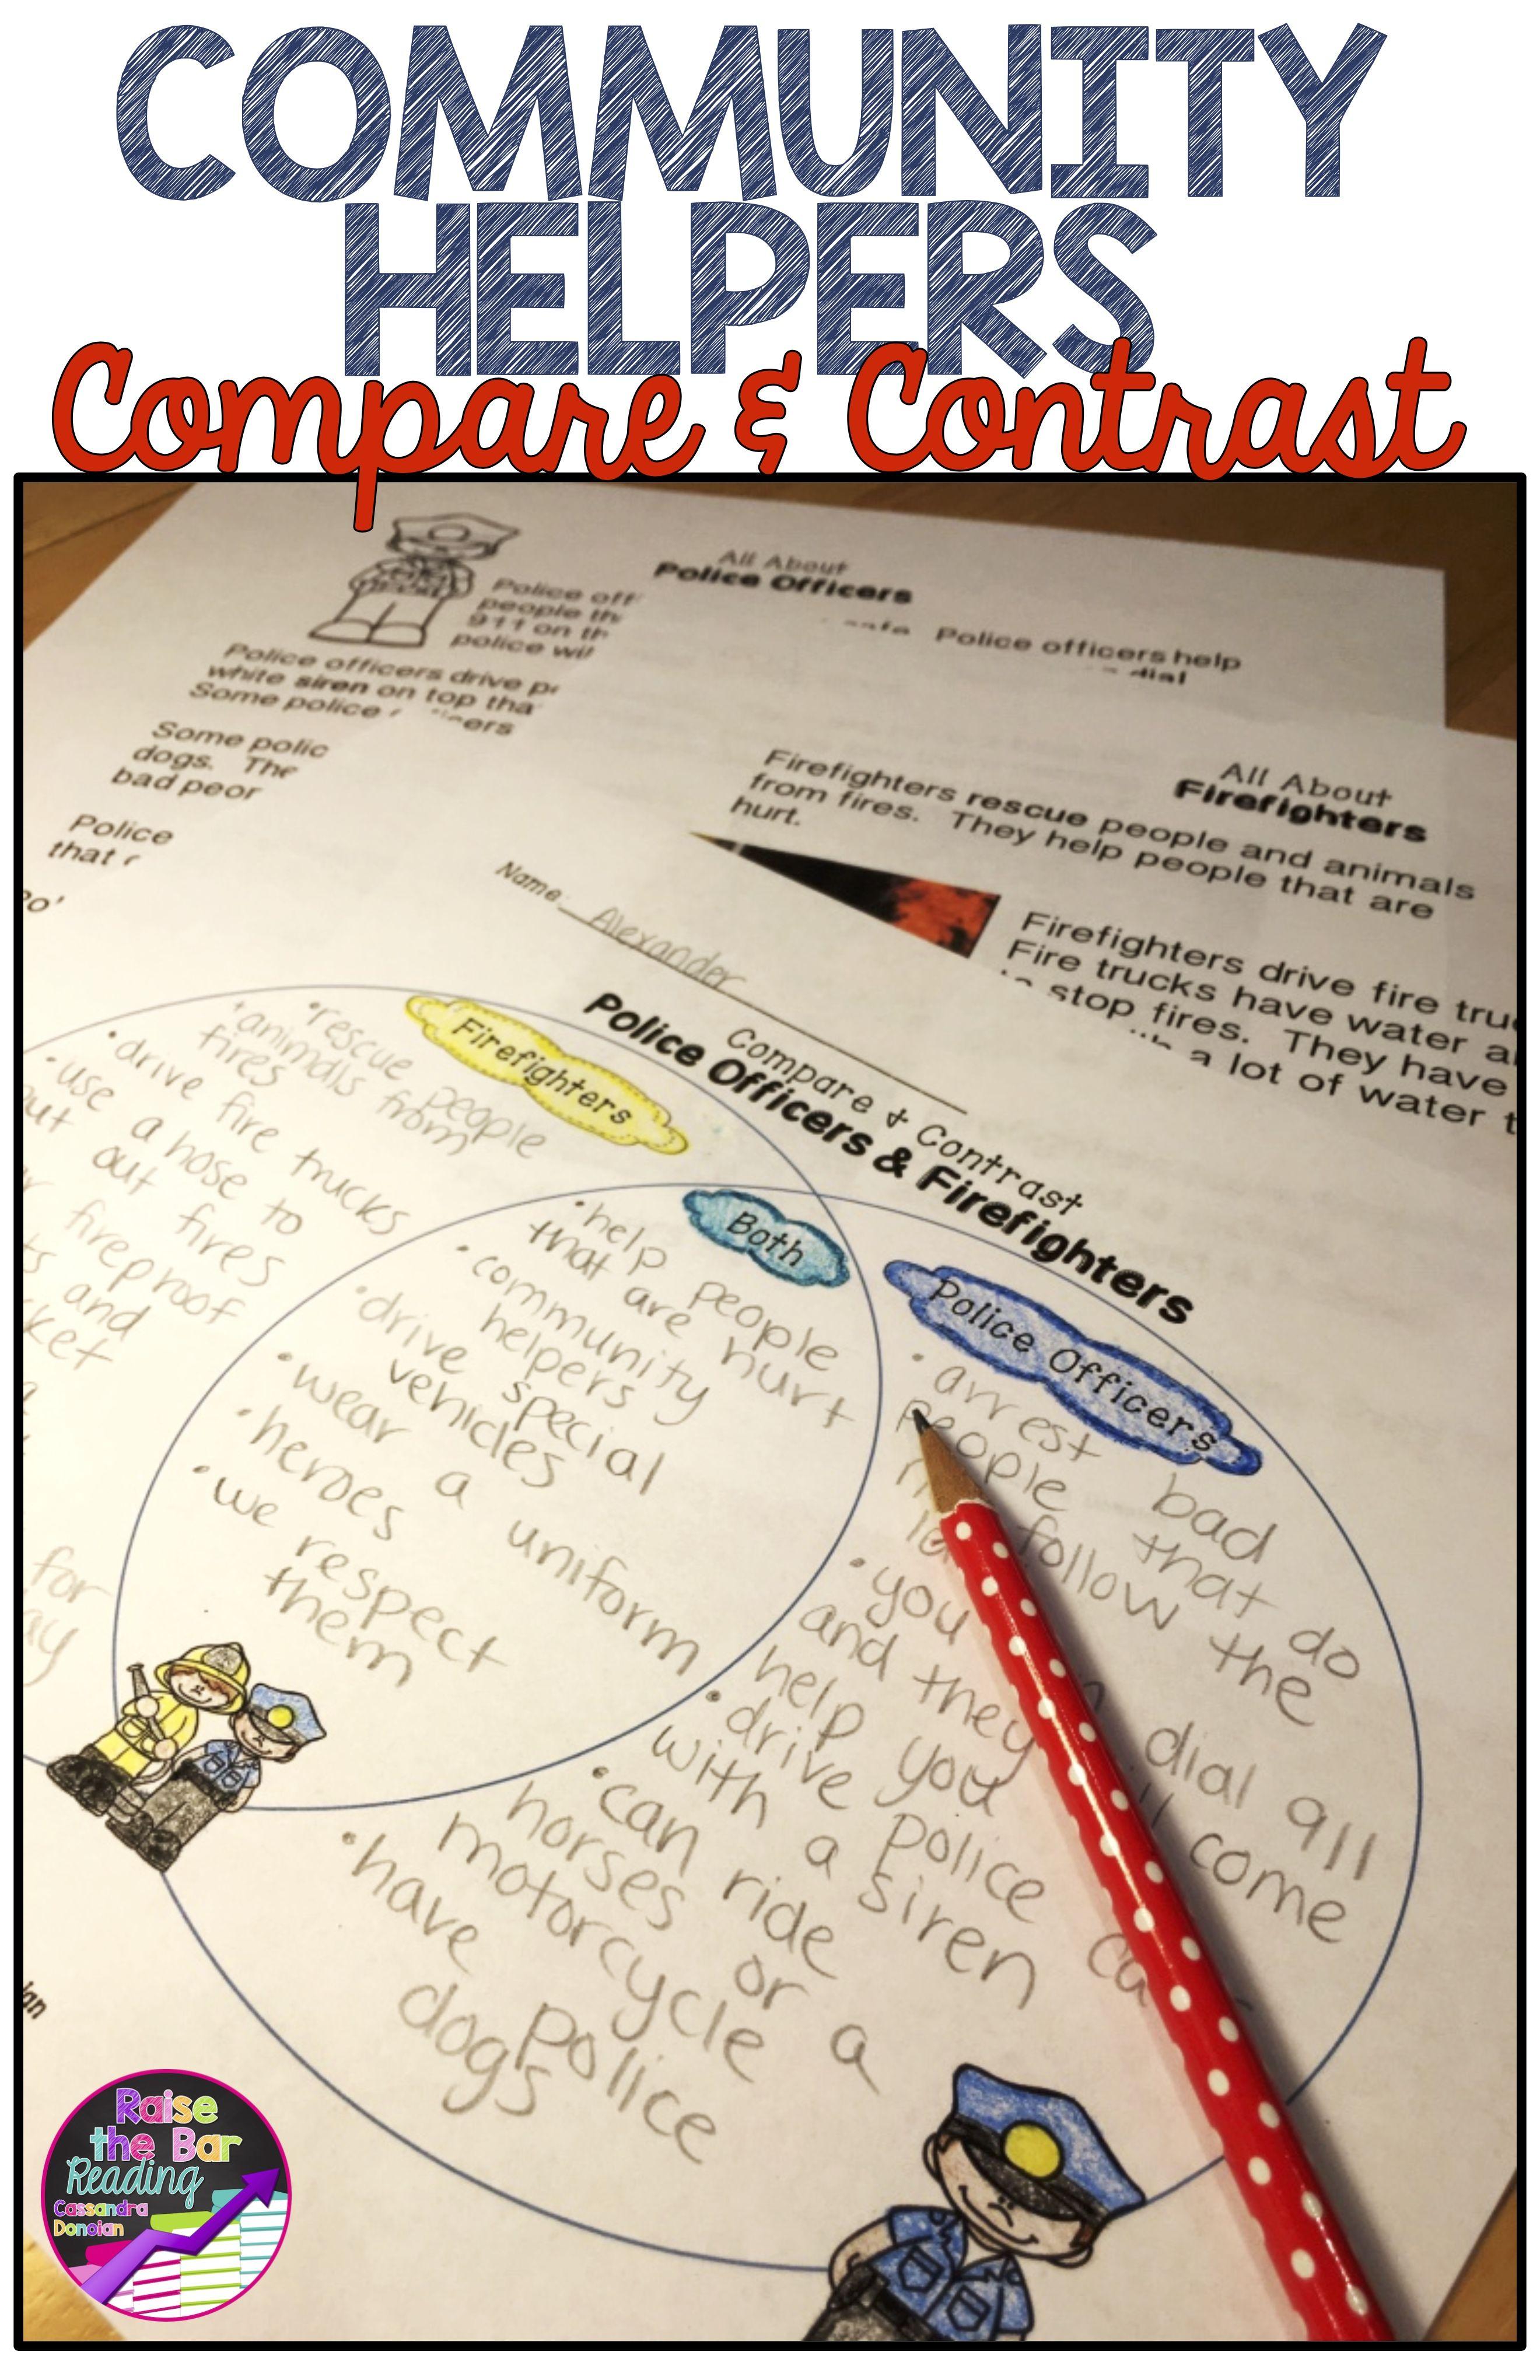 Community Helpers Reading Passages Compare Contrast Community Helpers Reading Passages Compare And Contrast [ 4080 x 2640 Pixel ]